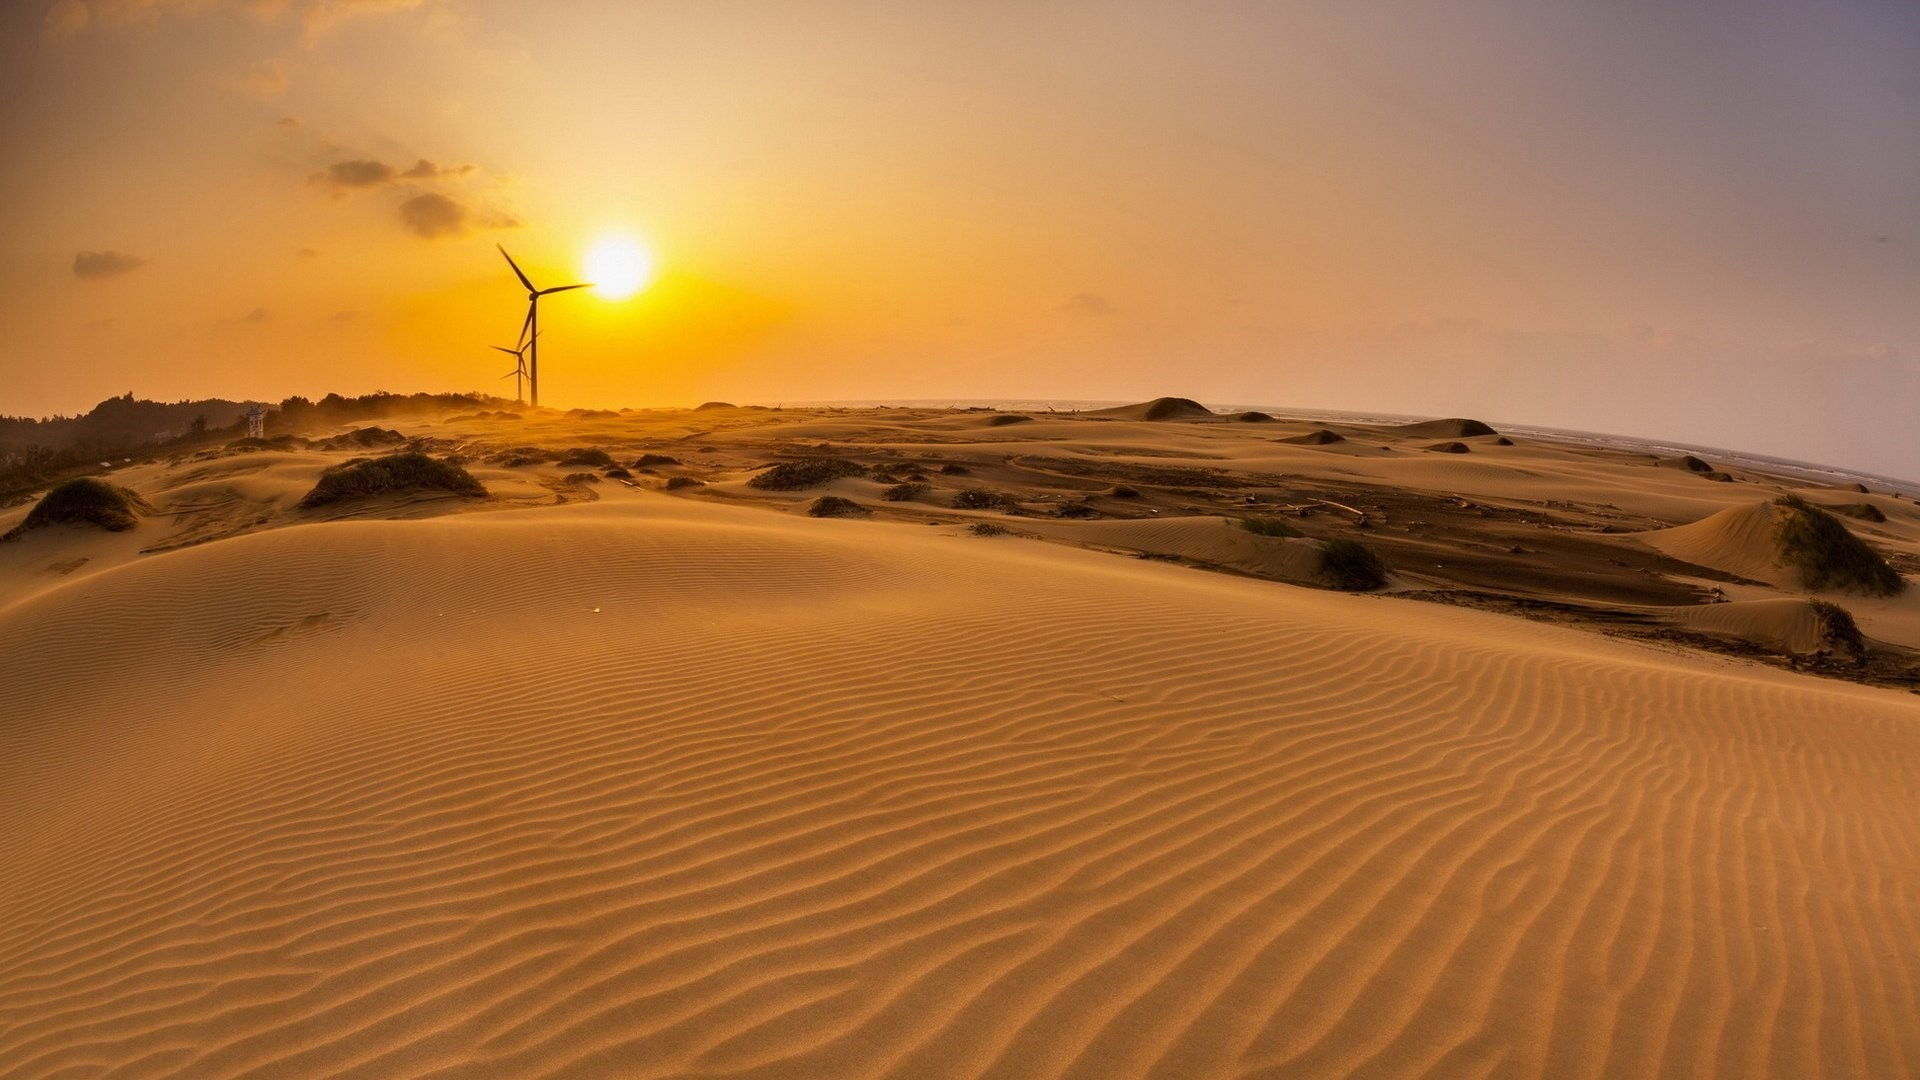 Desert High Quality